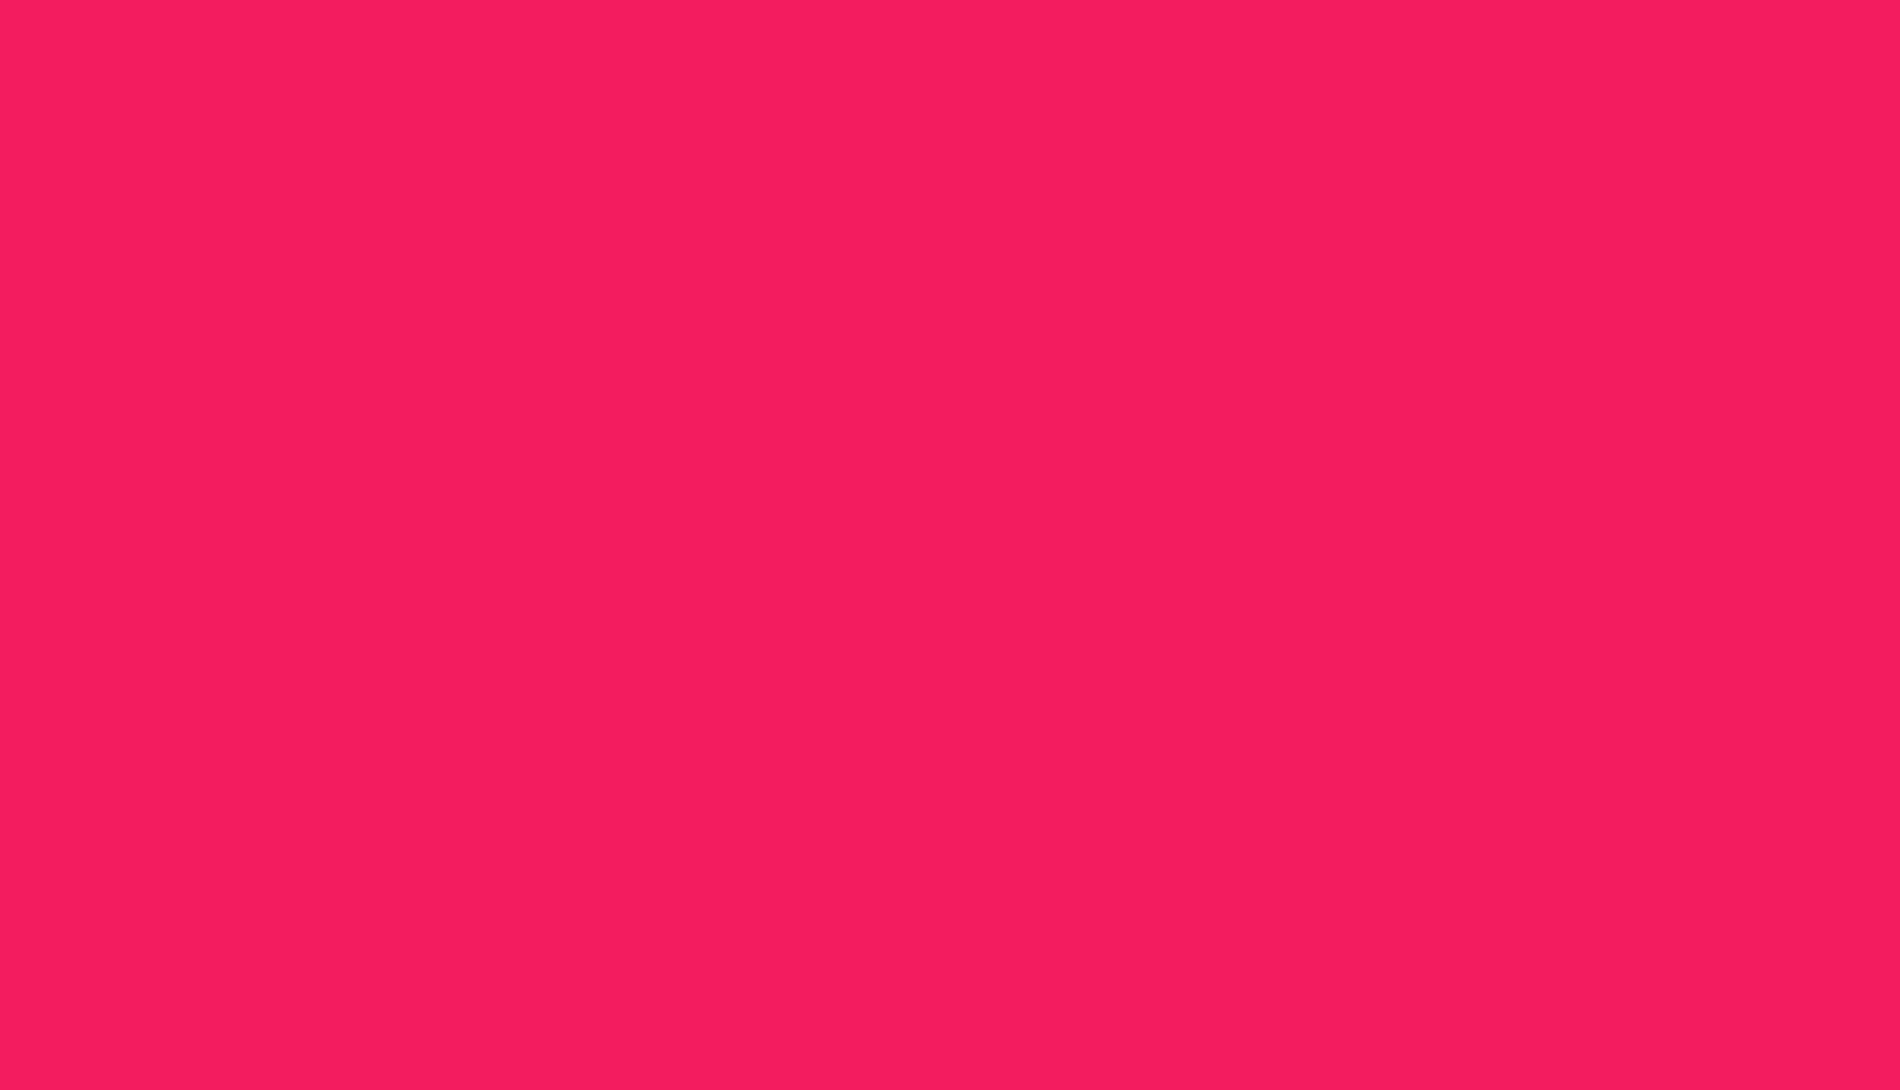 Vitality pink